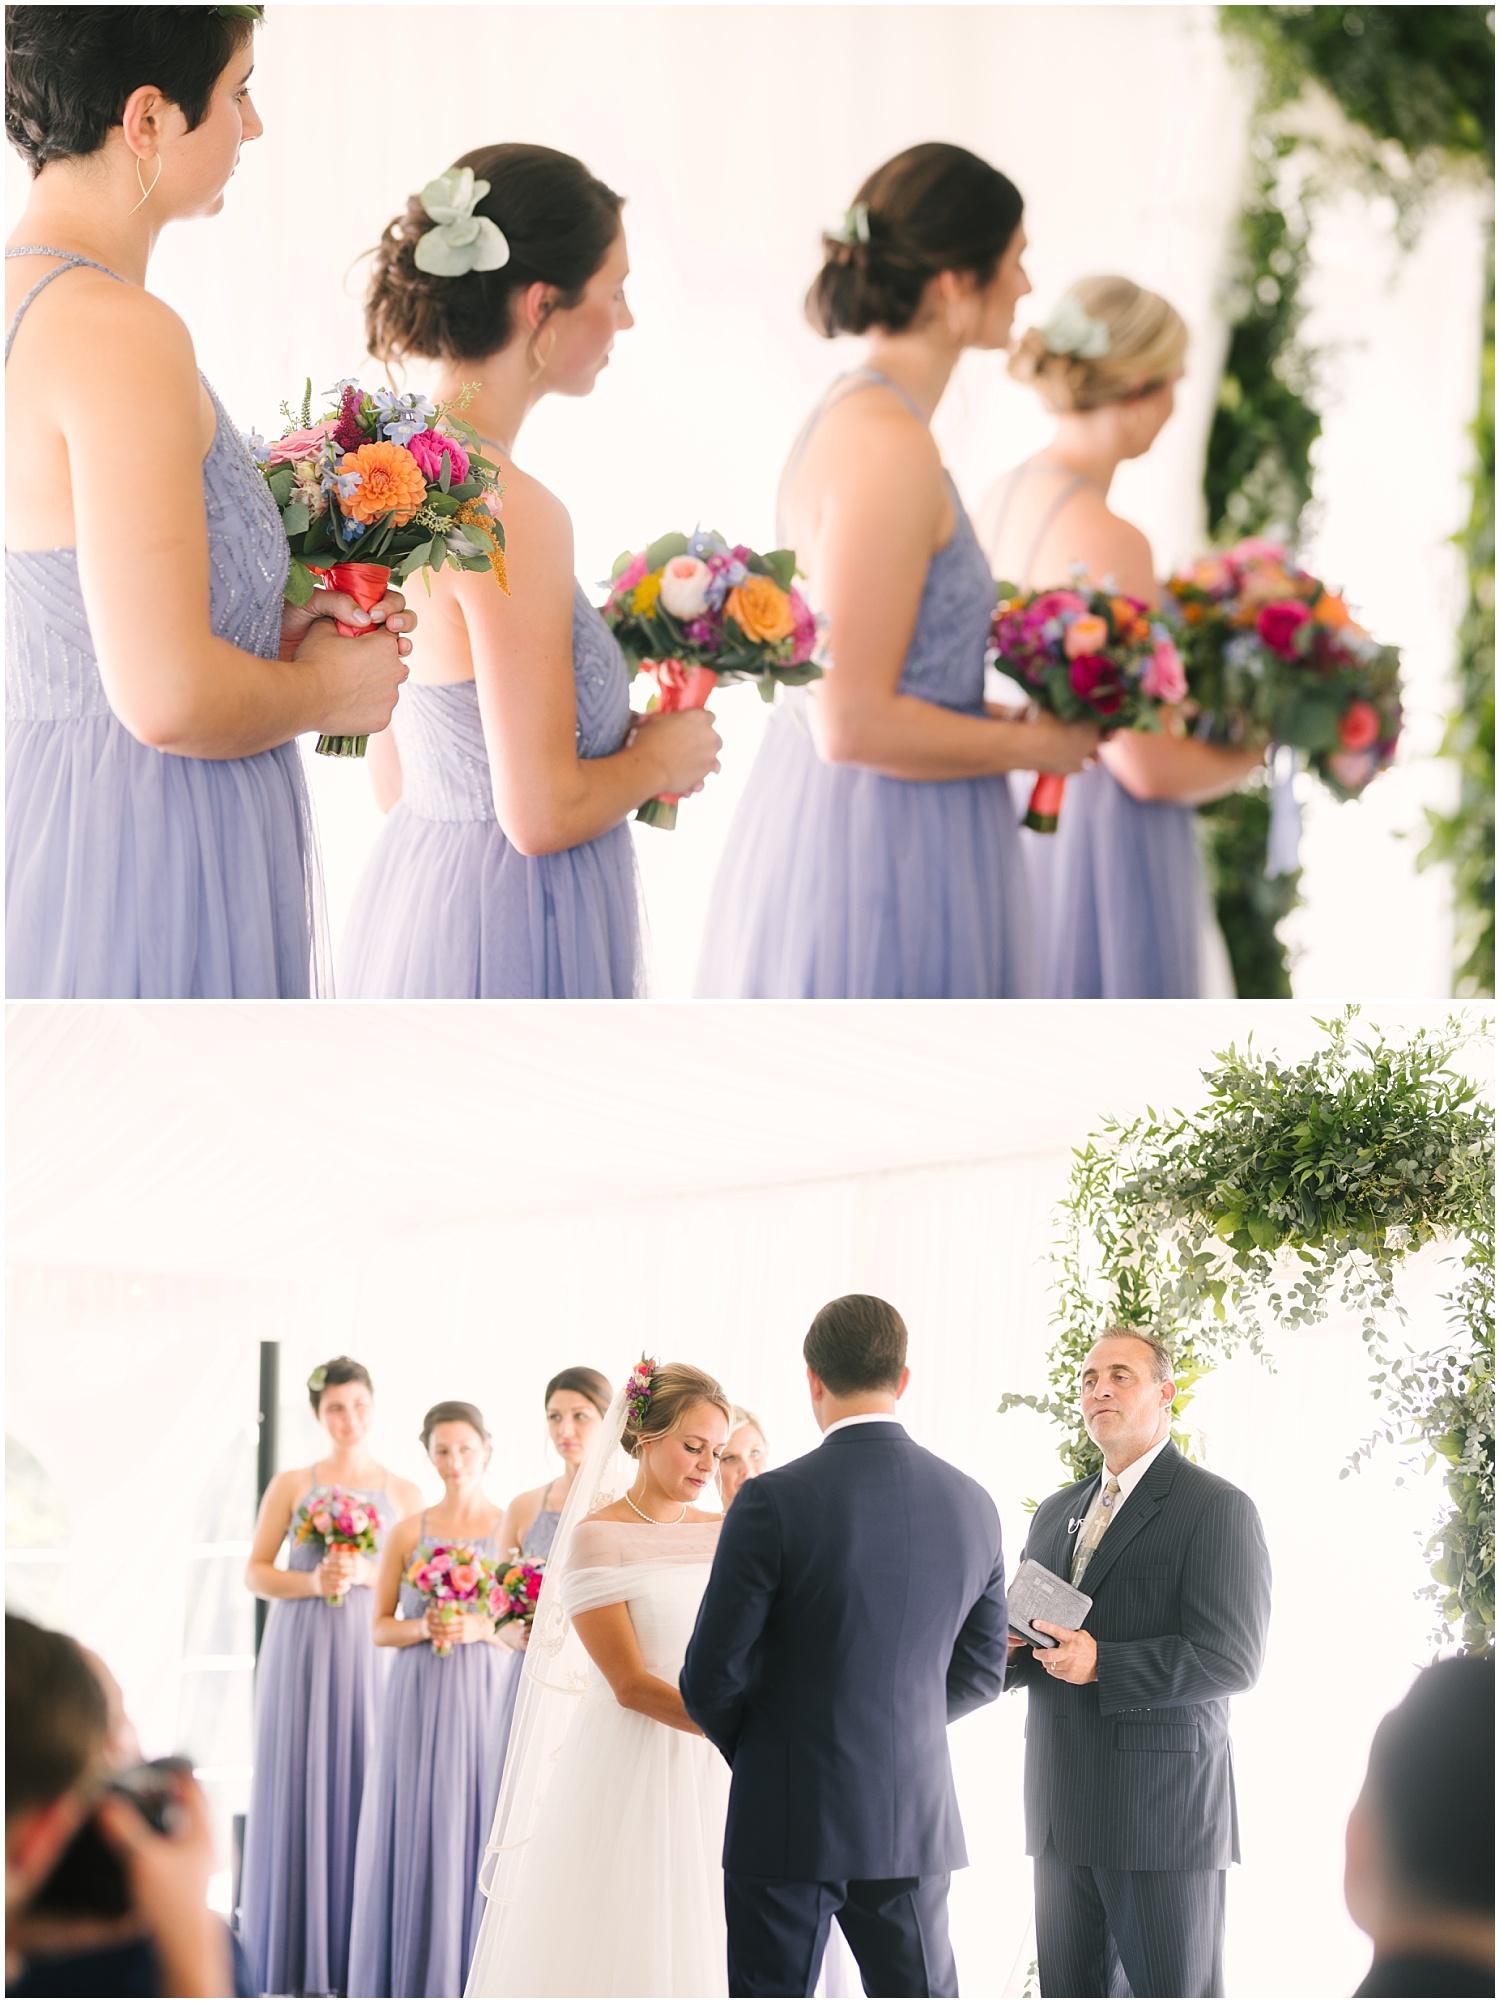 traditions+at+the+glen+wedding+binghamton+wedding (54).jpg